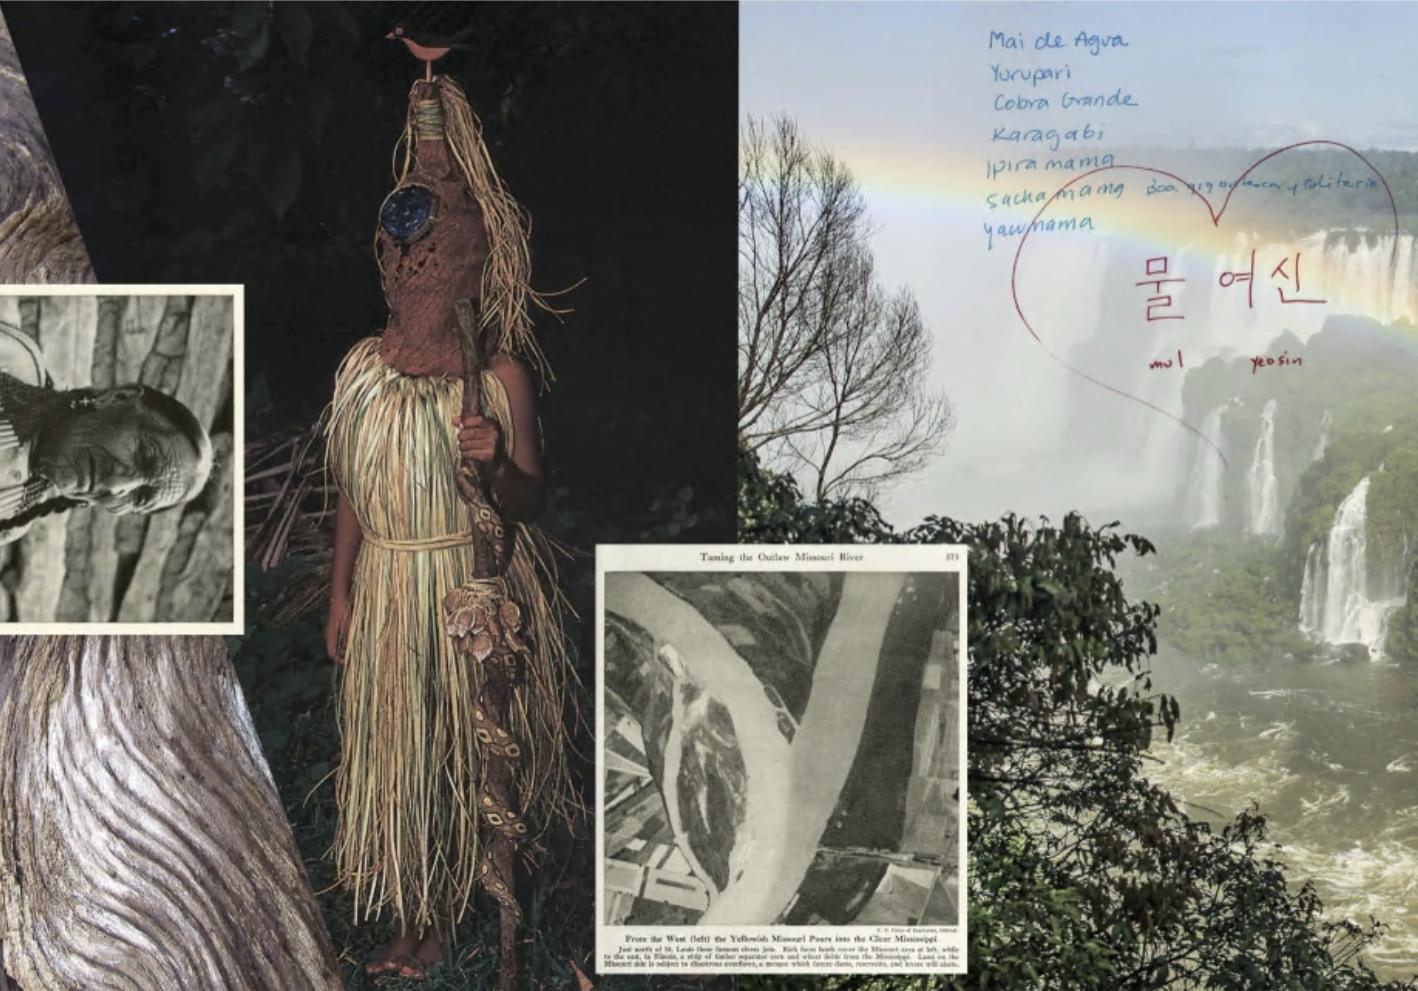 Carolina Caycedo 'Serpent River Book' 2017